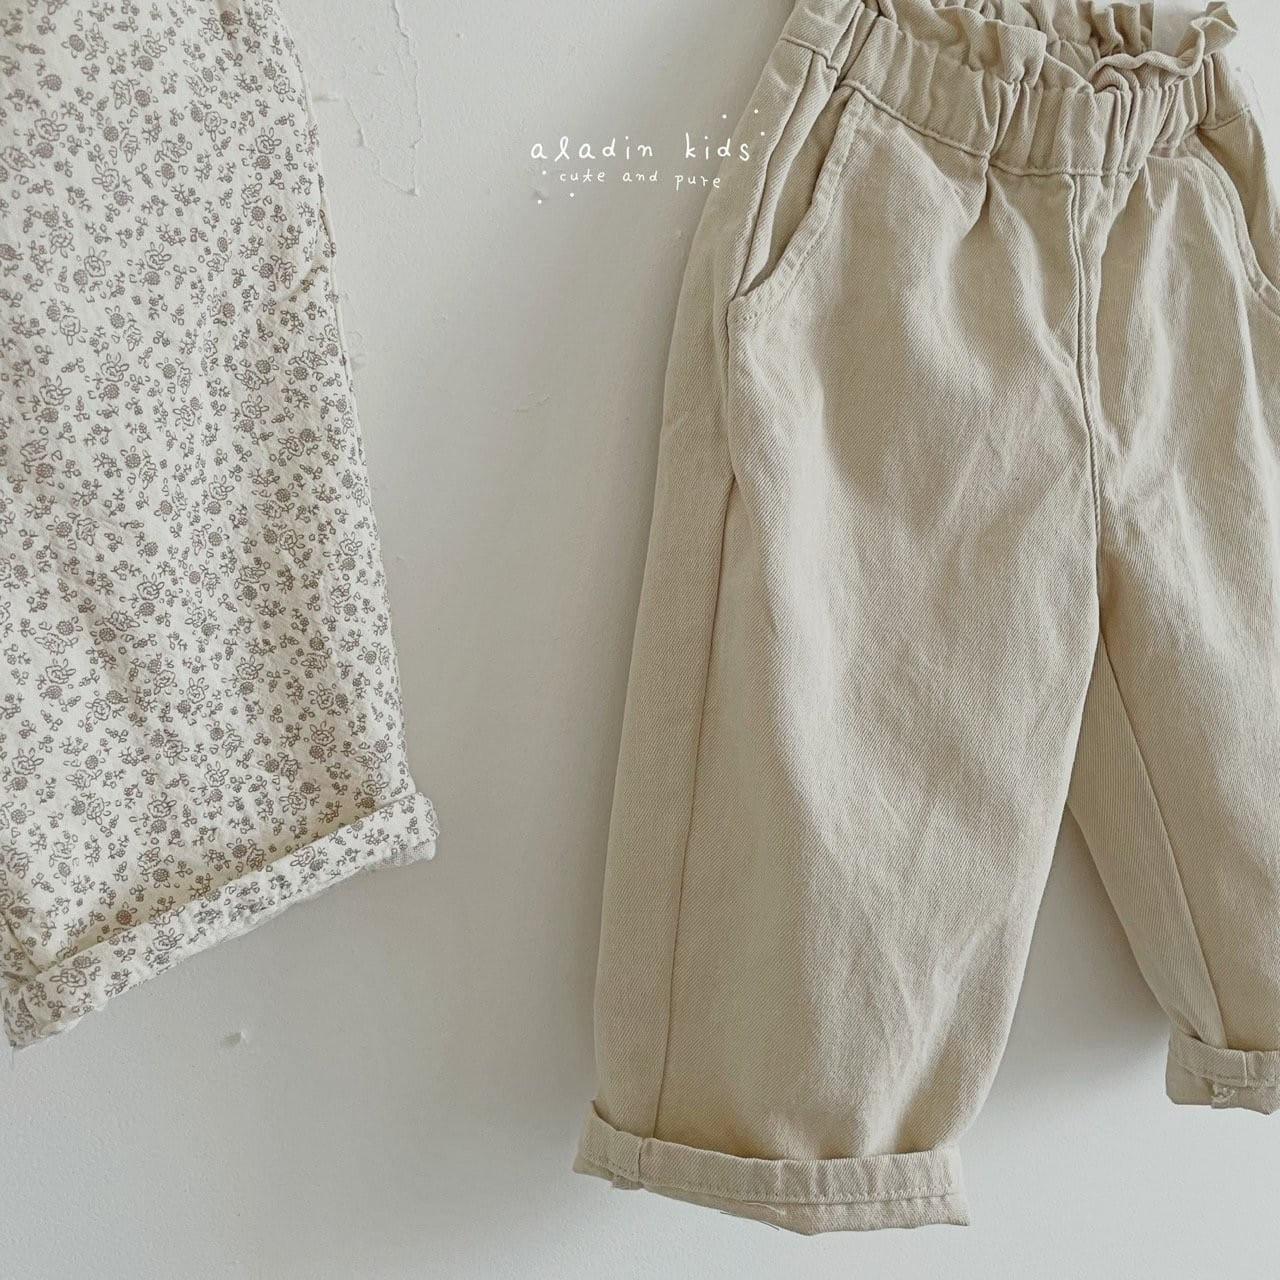 ALADIN - Korean Children Fashion - #Kfashion4kids - Frill Pants - 7